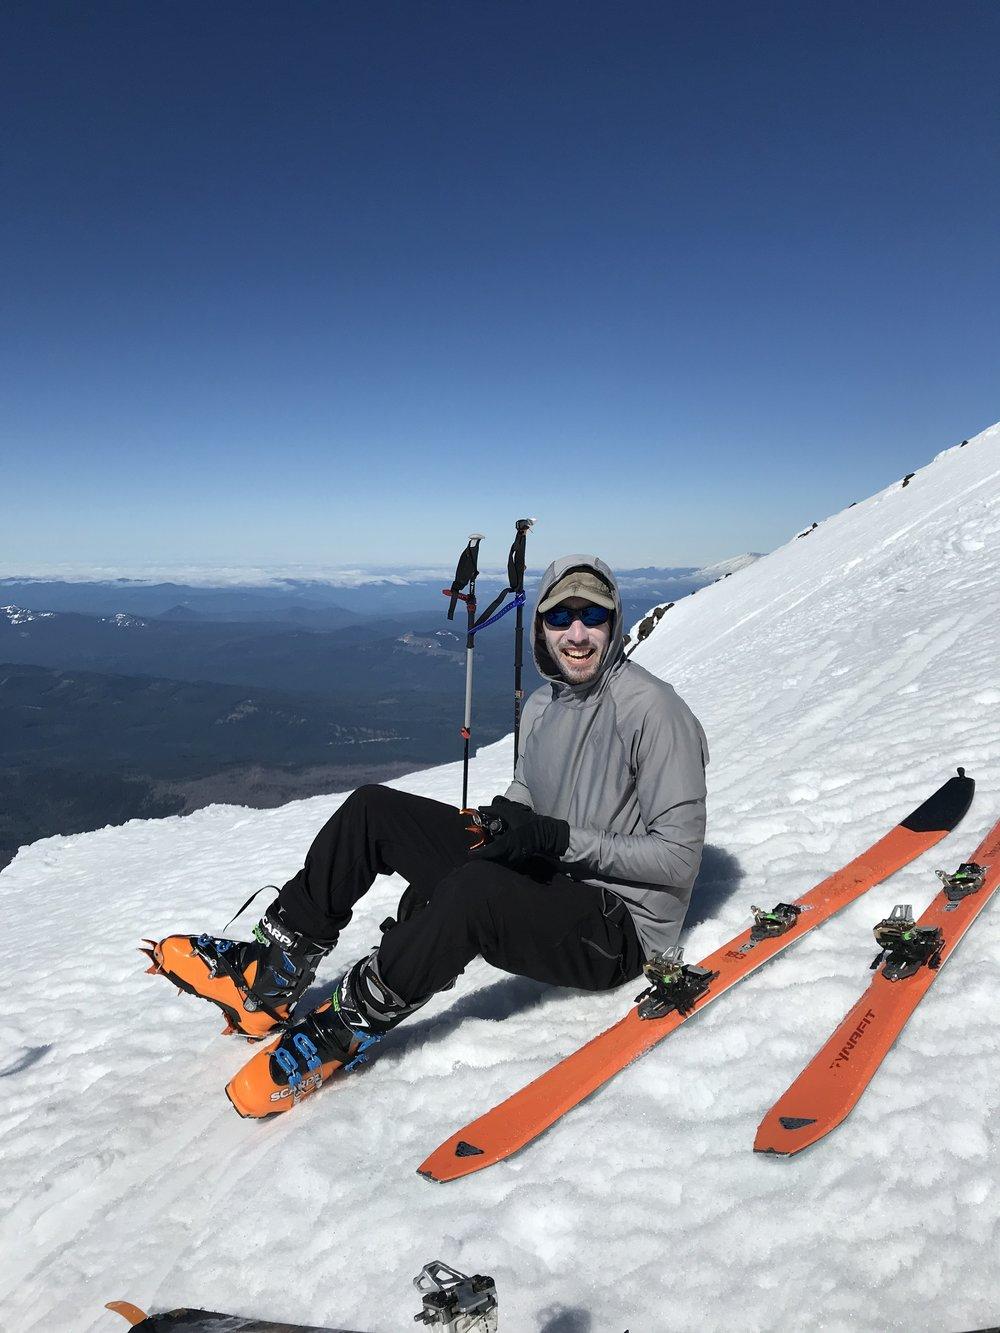 putting on crampons - Near Piker's Peak, Washington